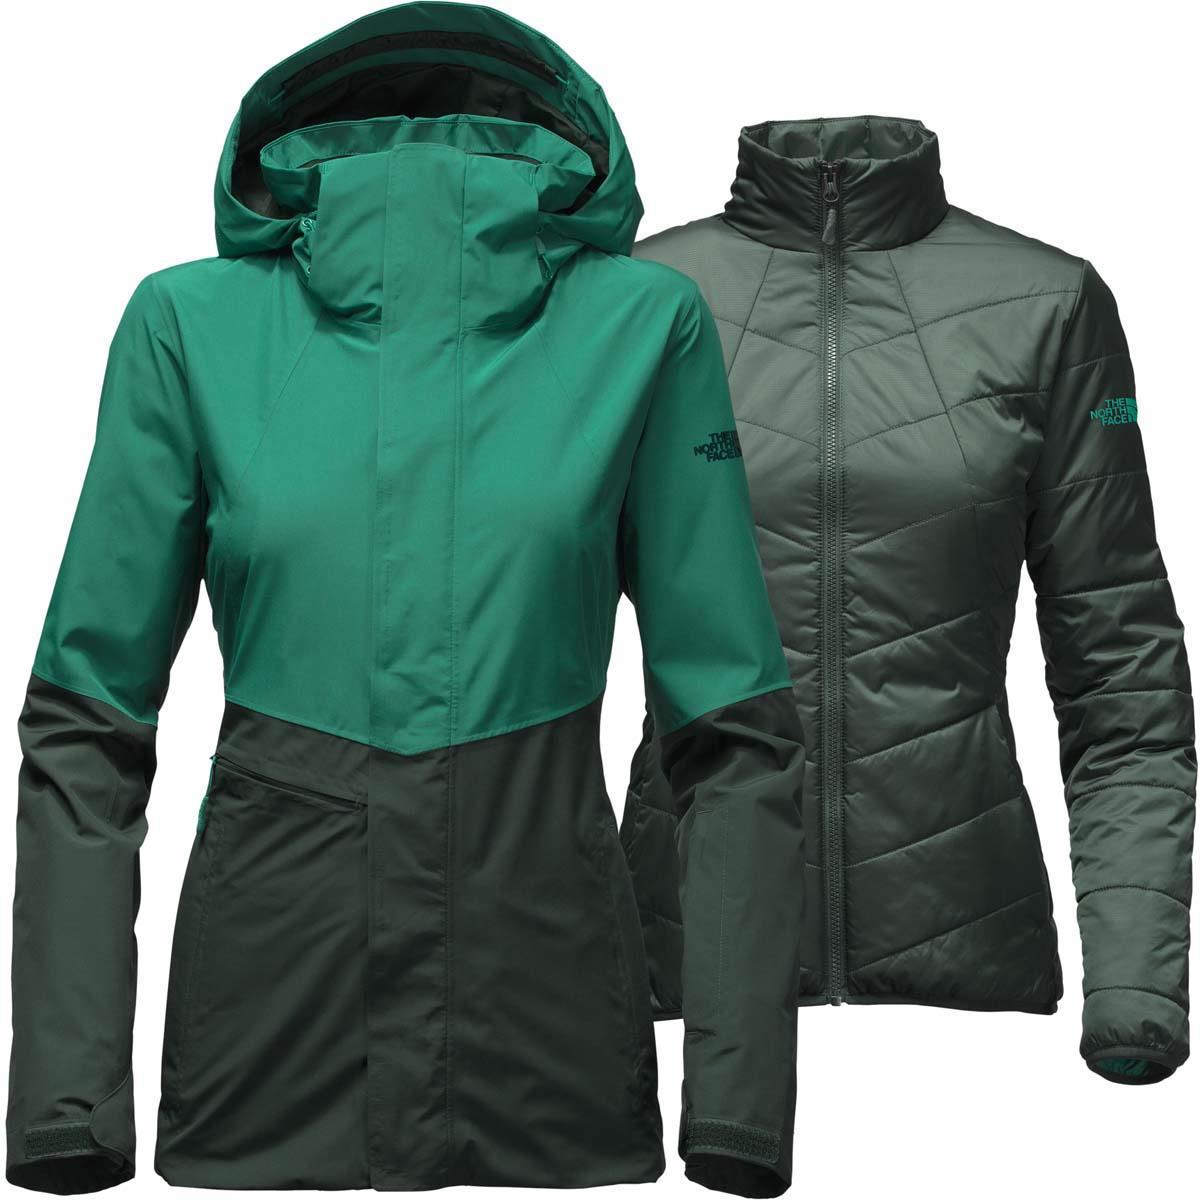 1315c50fcbff5 The North Face Garner Triclimate Jacket - Women's | Buckmans.com